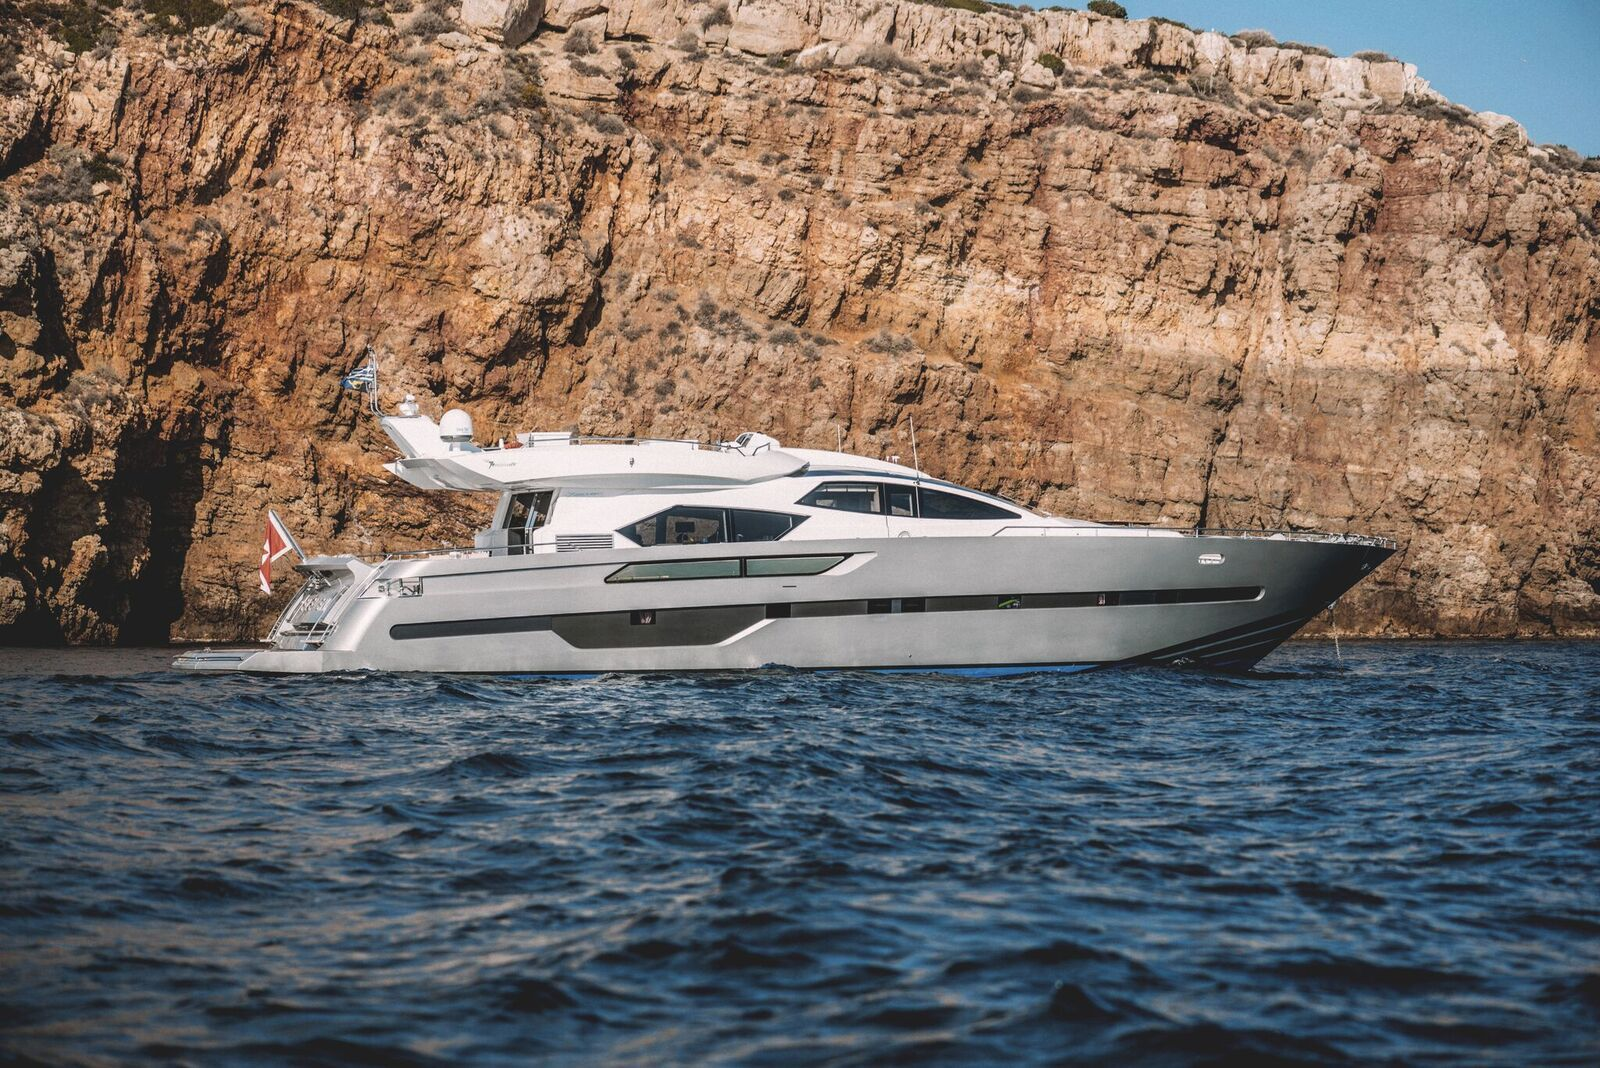 ELEVEN I Italcraft 90 Motoryacht Side View